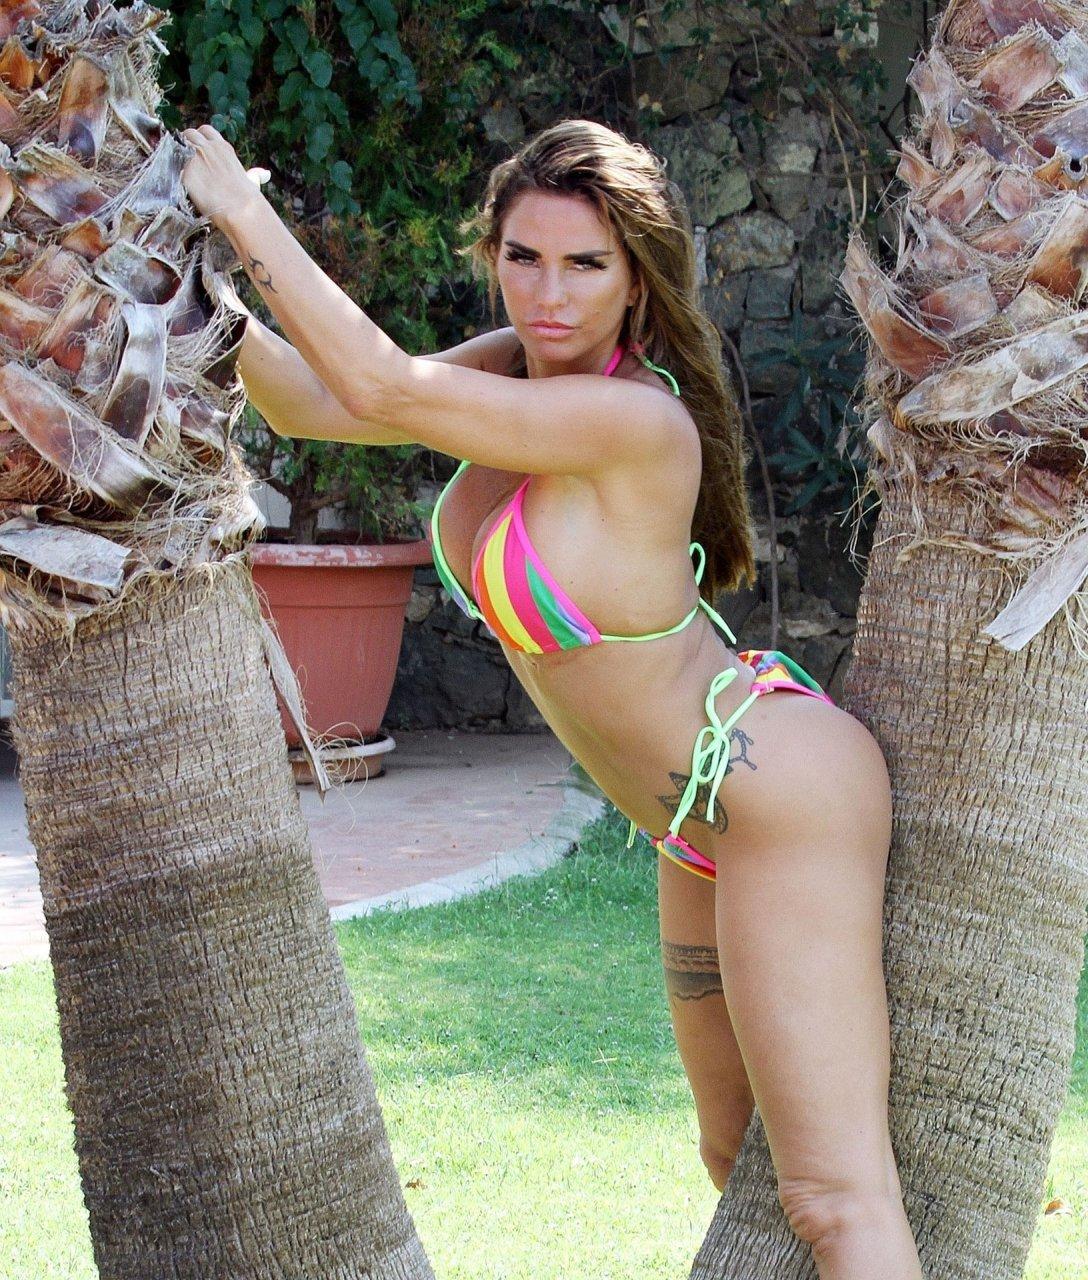 Katie-Price-Nude-Sexy-TheFappeningBlog.com-80.jpg